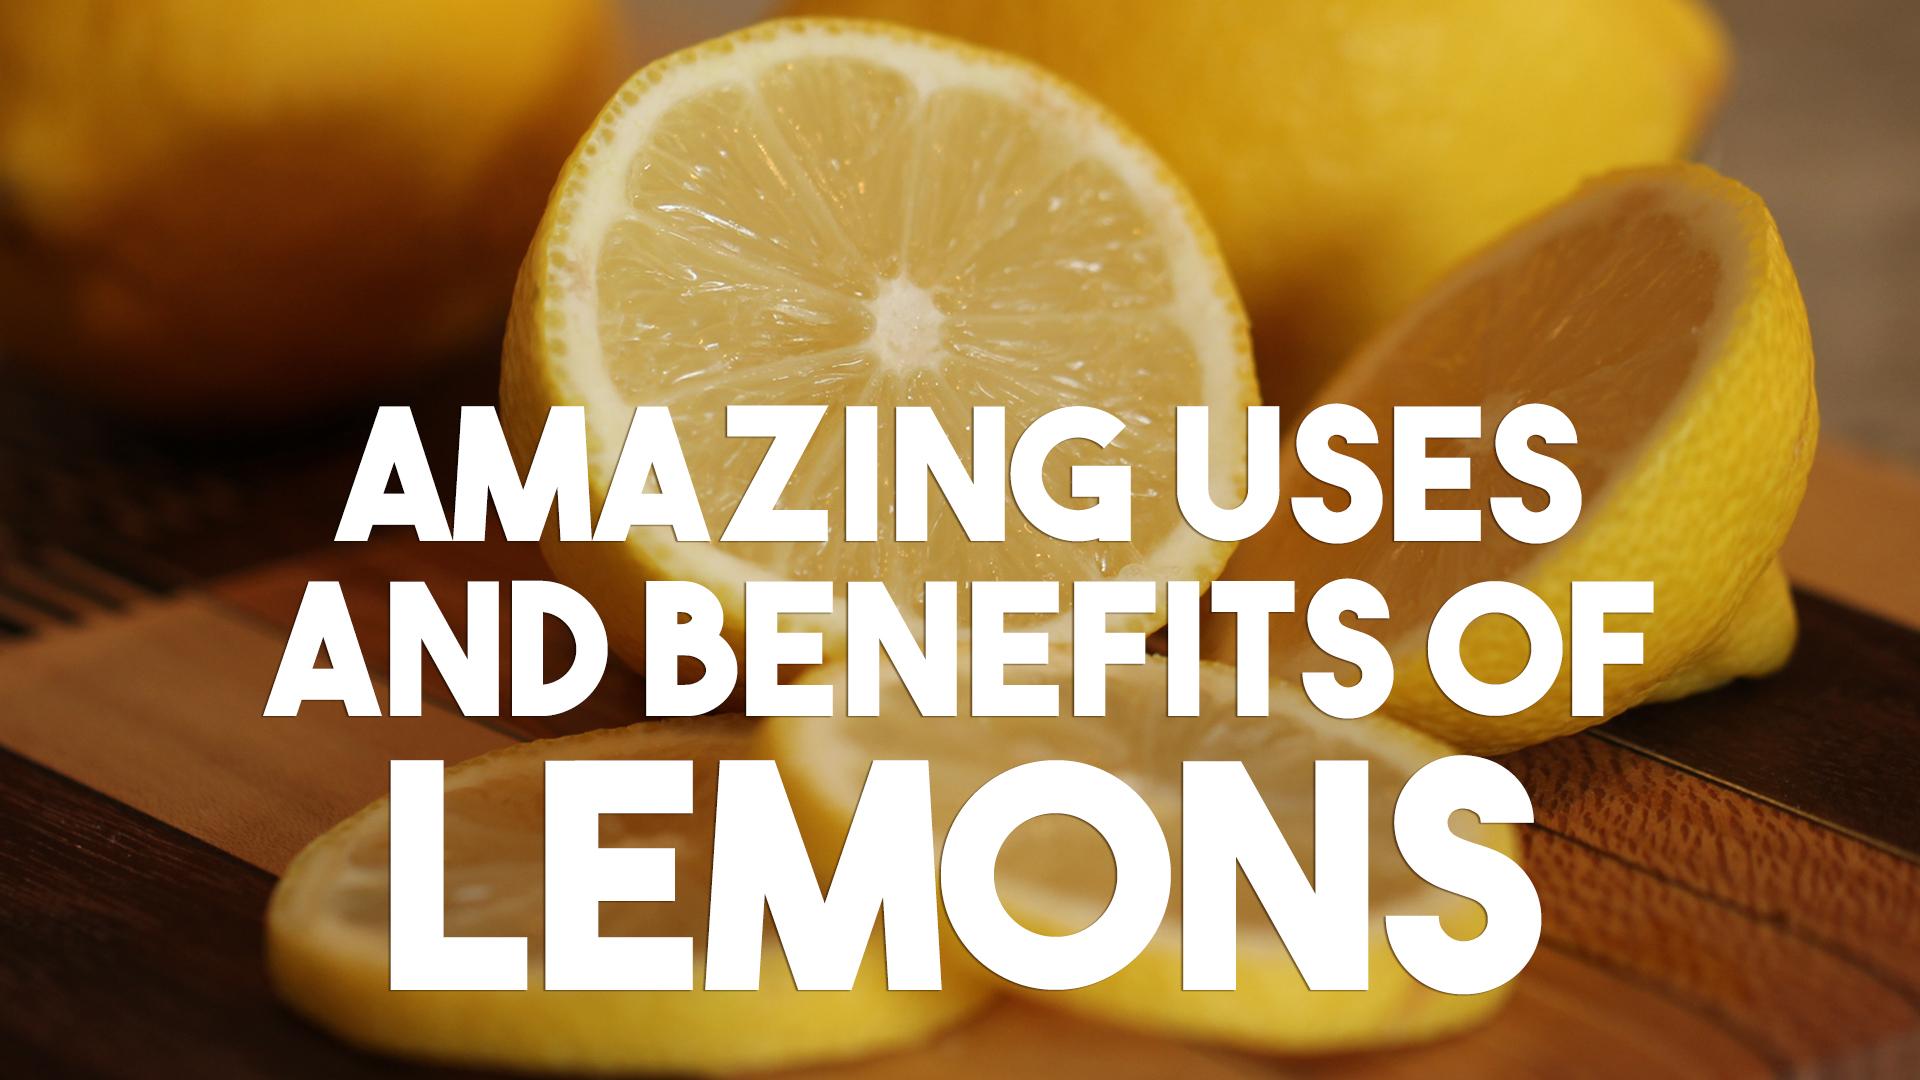 ★ Amazing Uses And Benefits Of Lemons ★